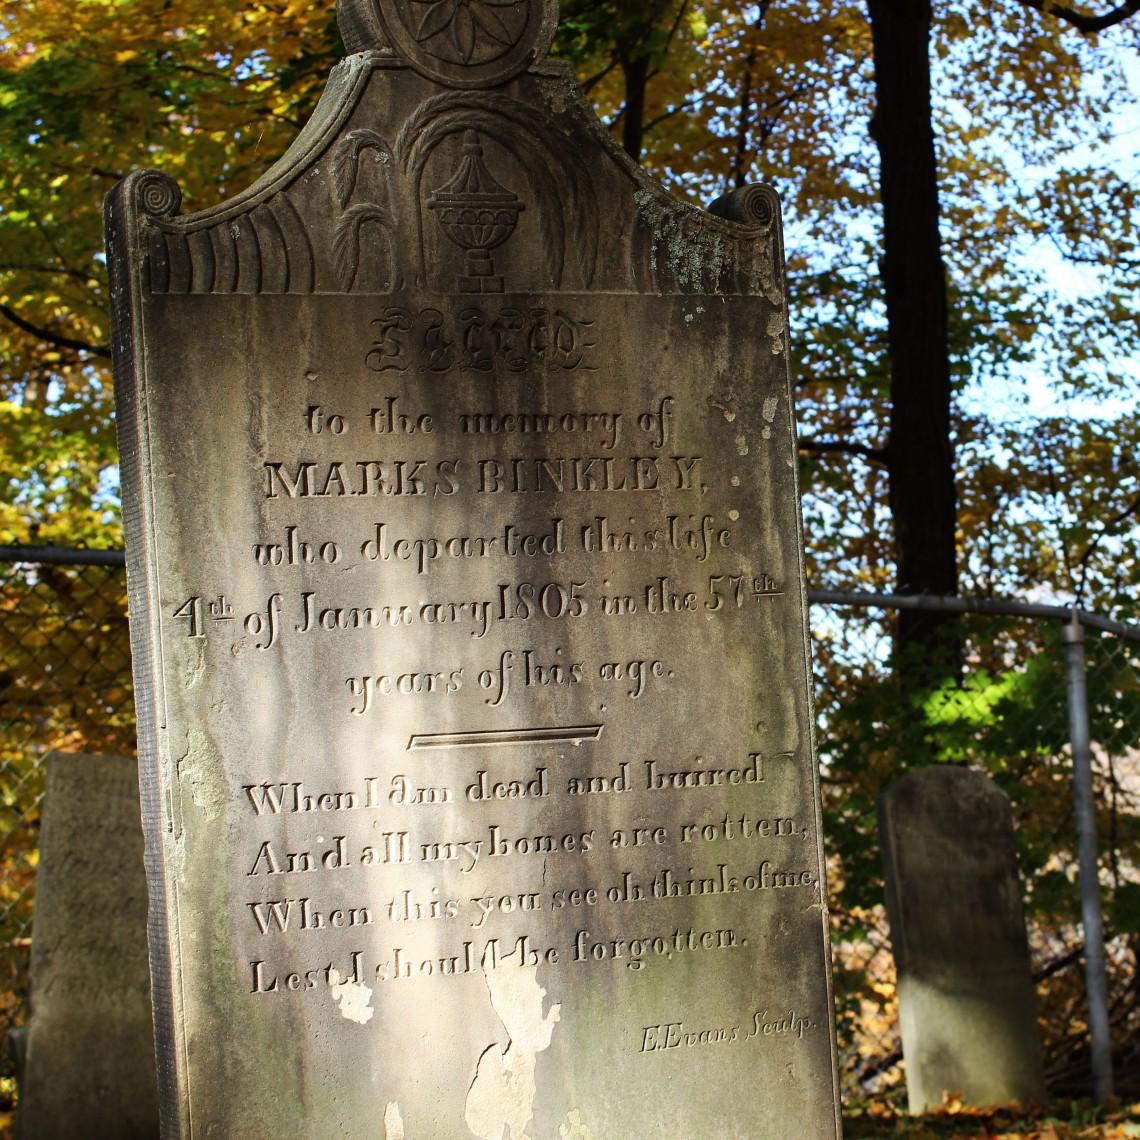 Binkley 1803 Cemetery, Hamilton (Ont). Photo by @erskinec